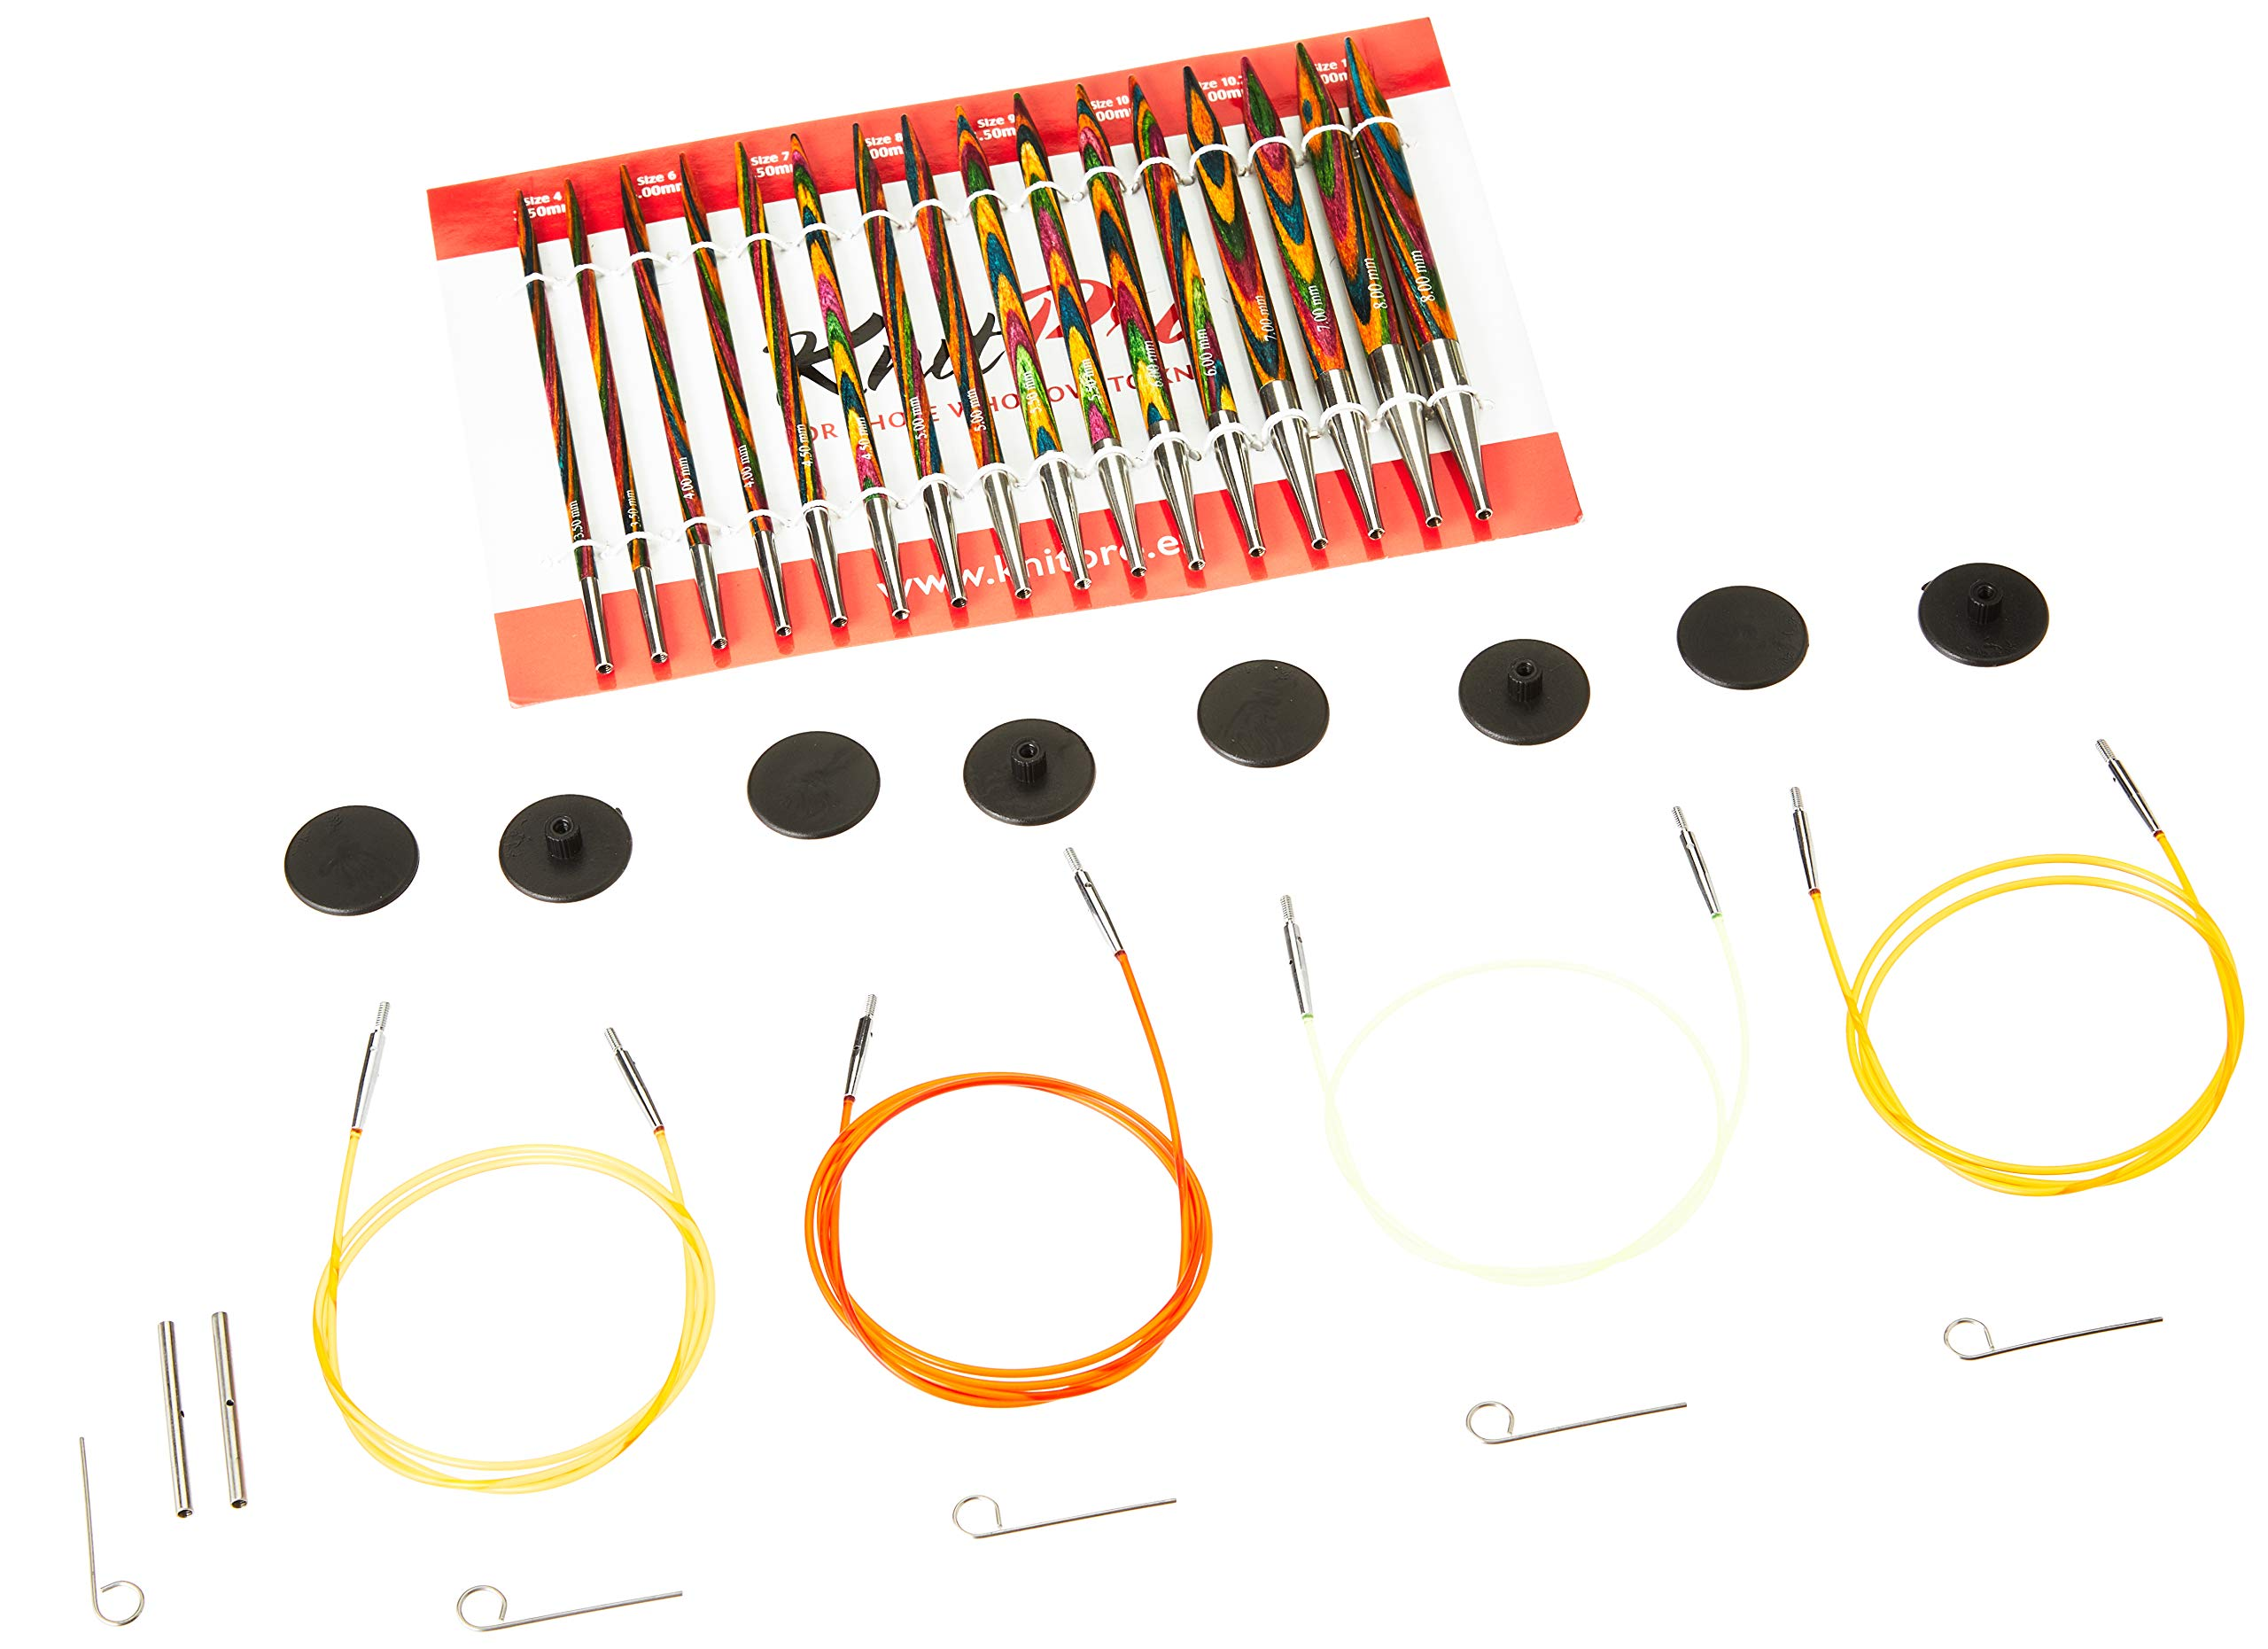 Knit Pro Symfonie Interchangeable Needle Deluxe Set, Multi-Color